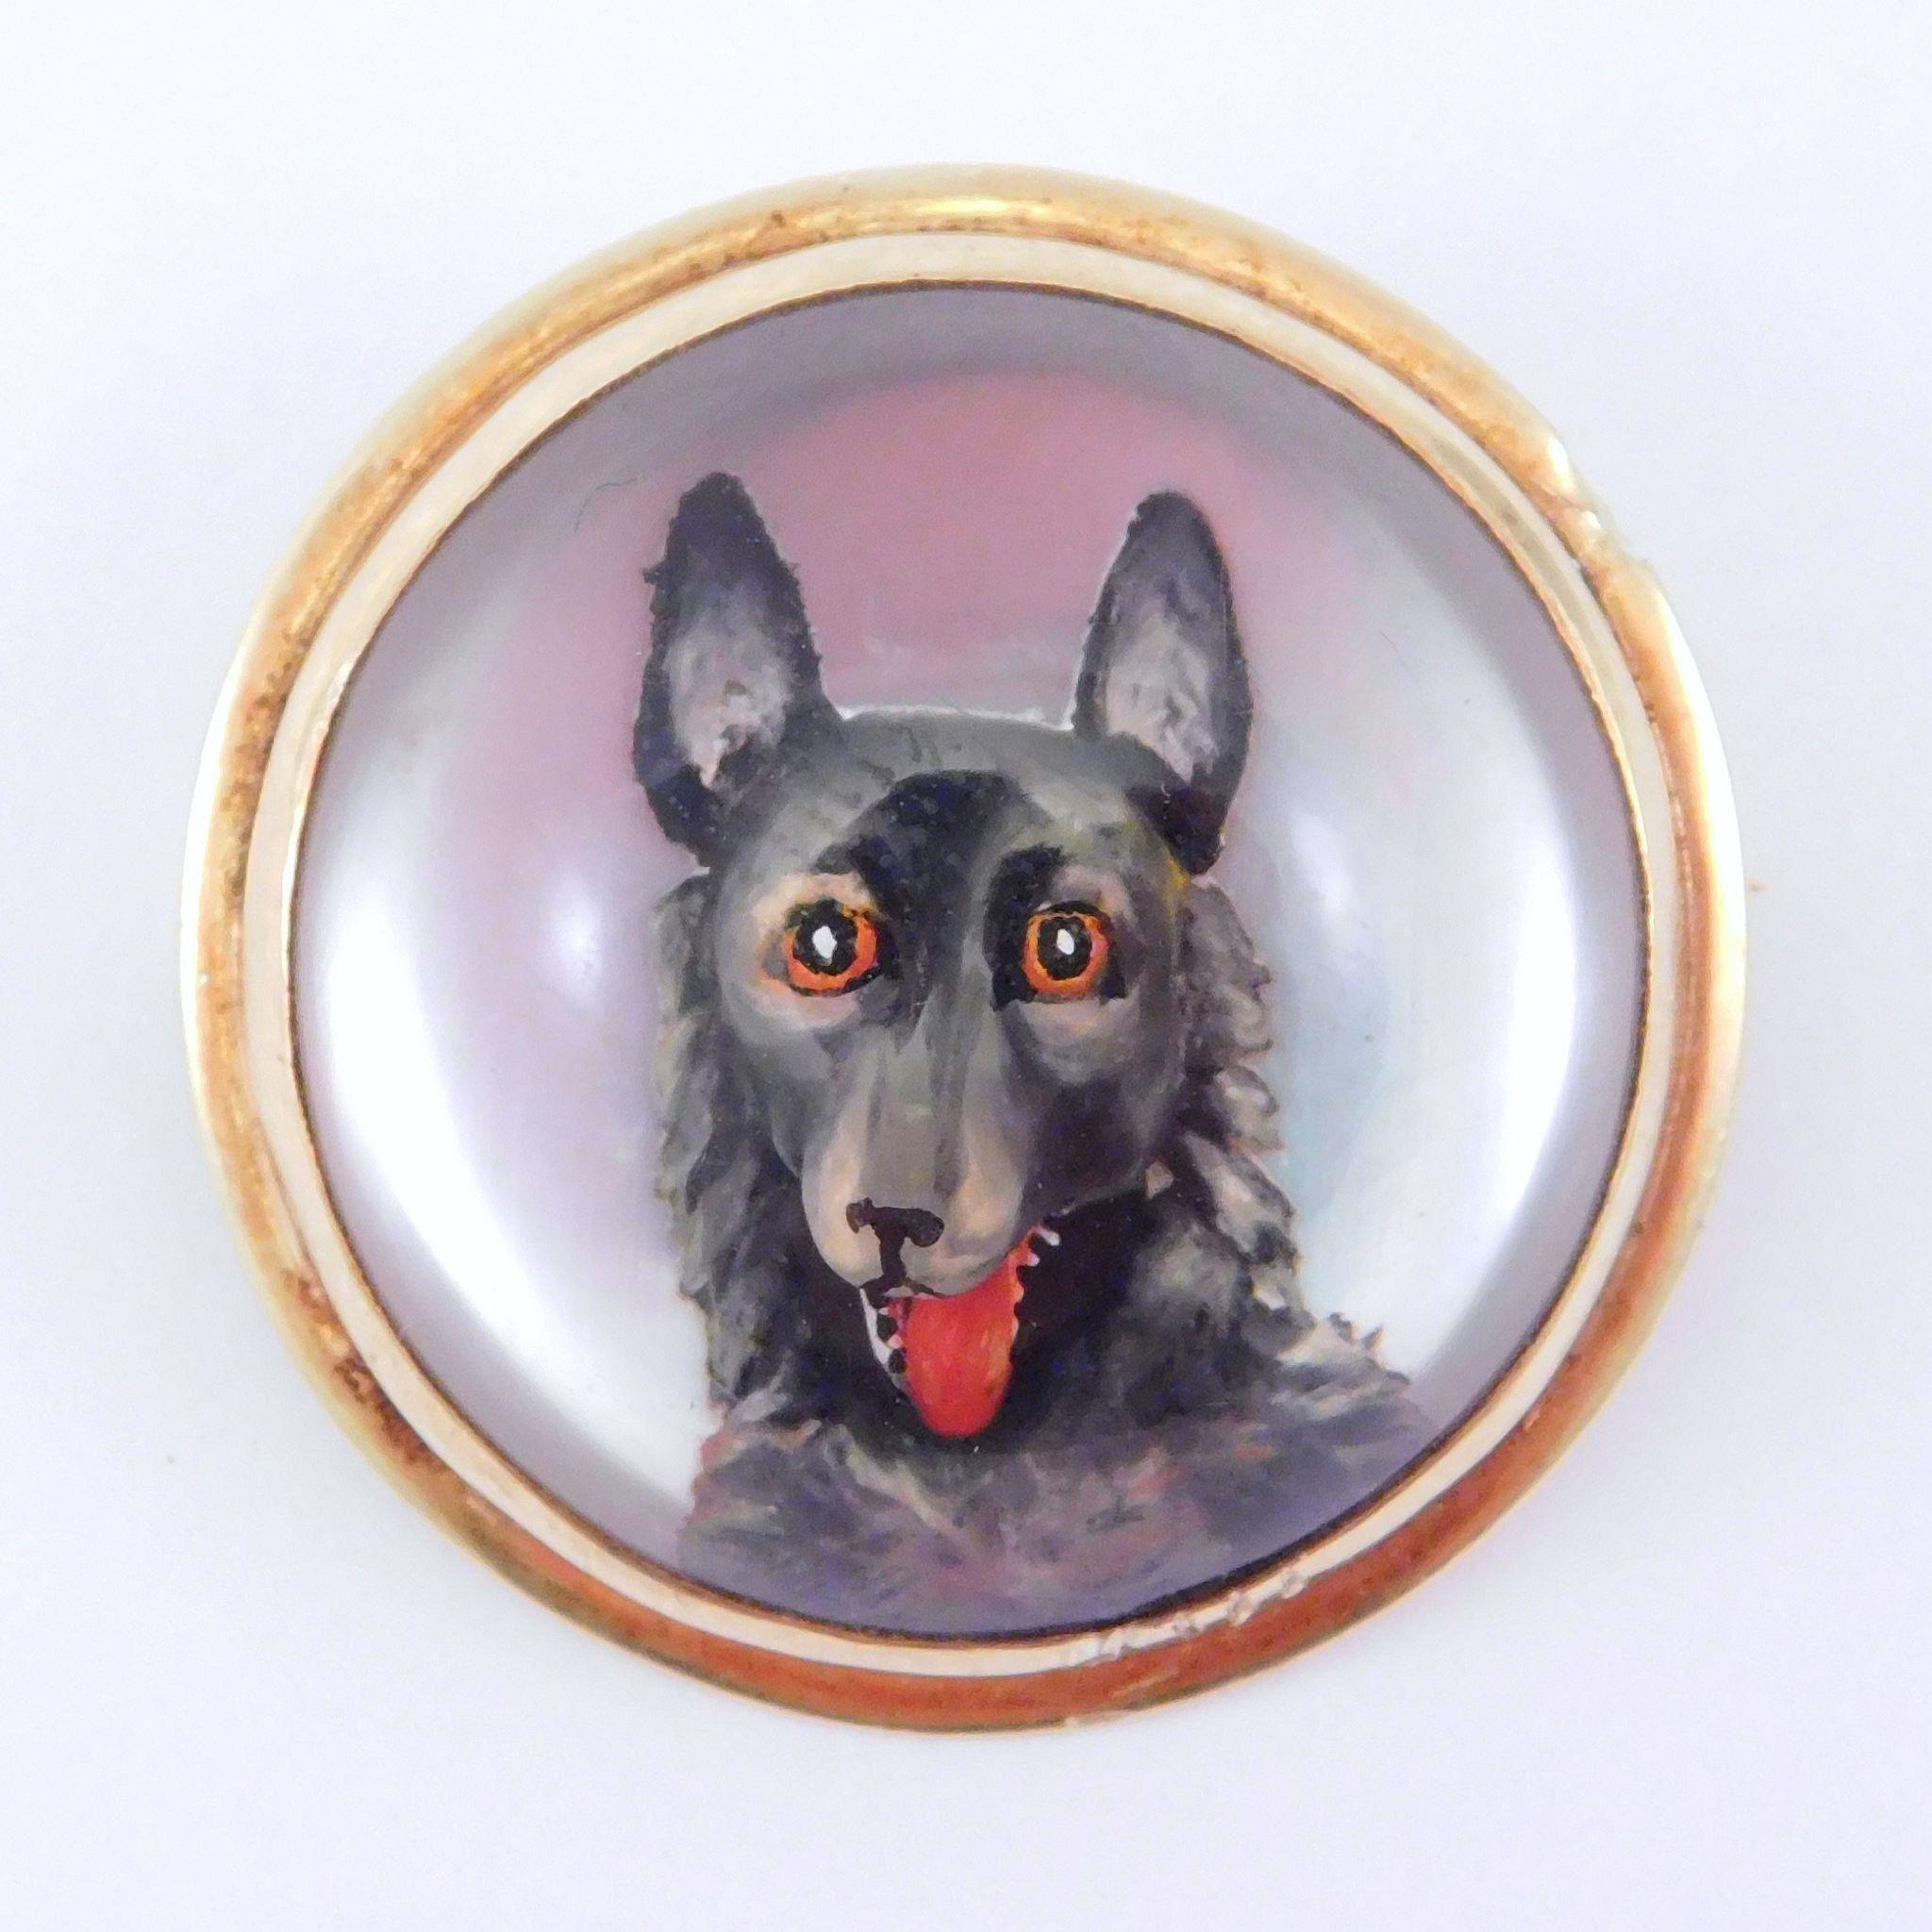 Antique 14K Essex Crystal Dog Brooch Pendant Rare